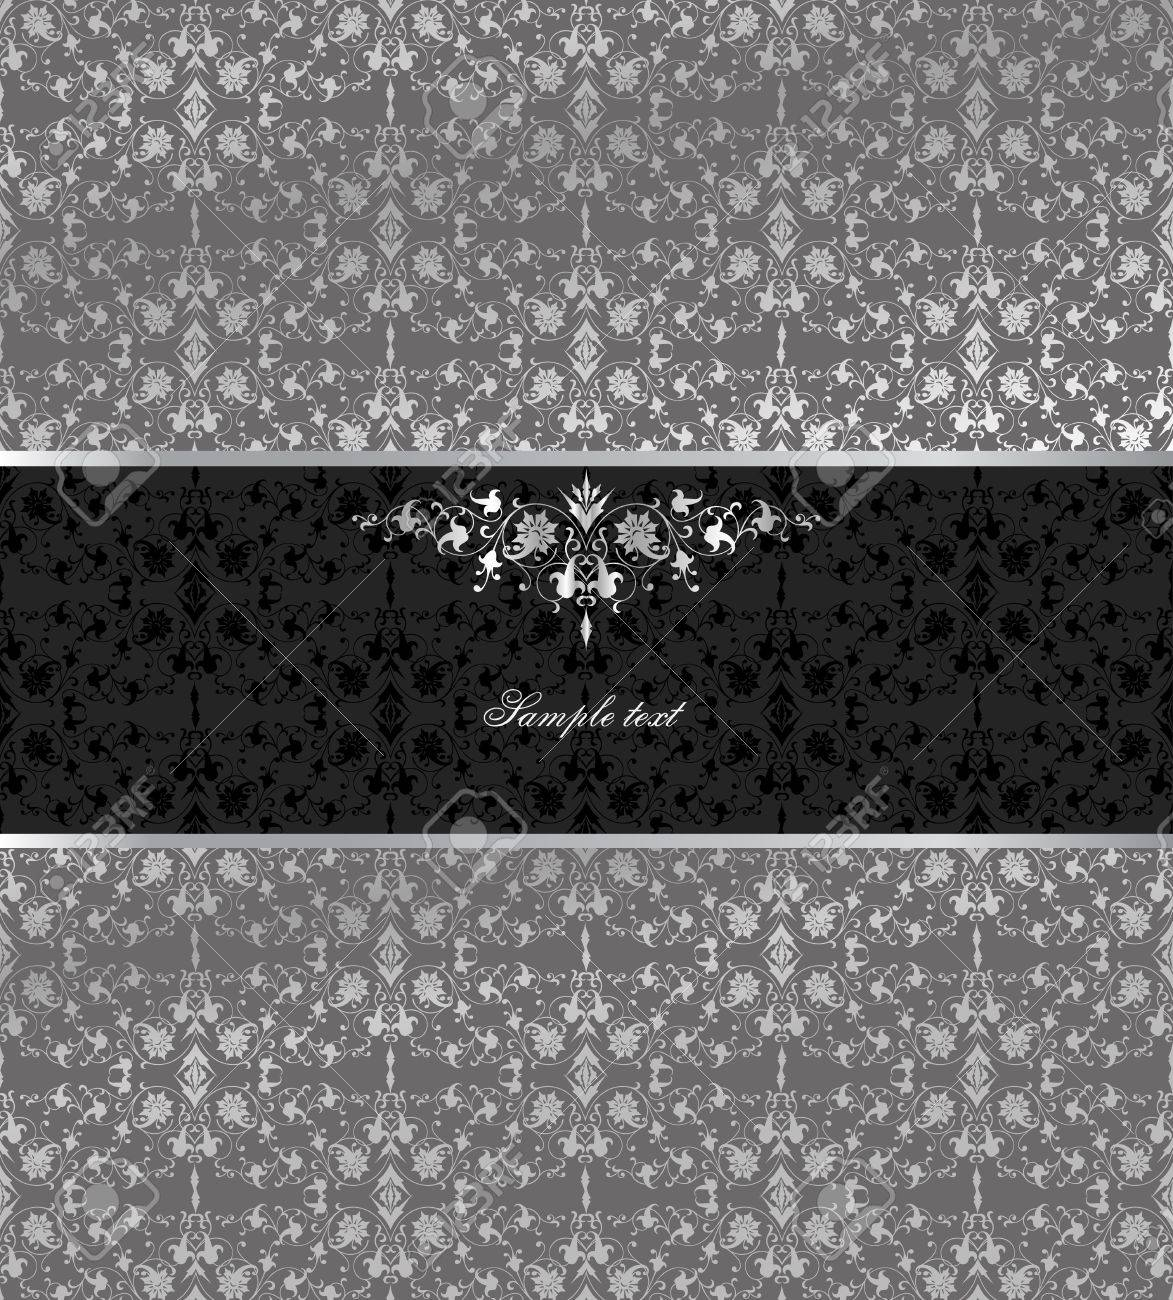 Floral seamless silver background  Vector Stock Vector - 15056796